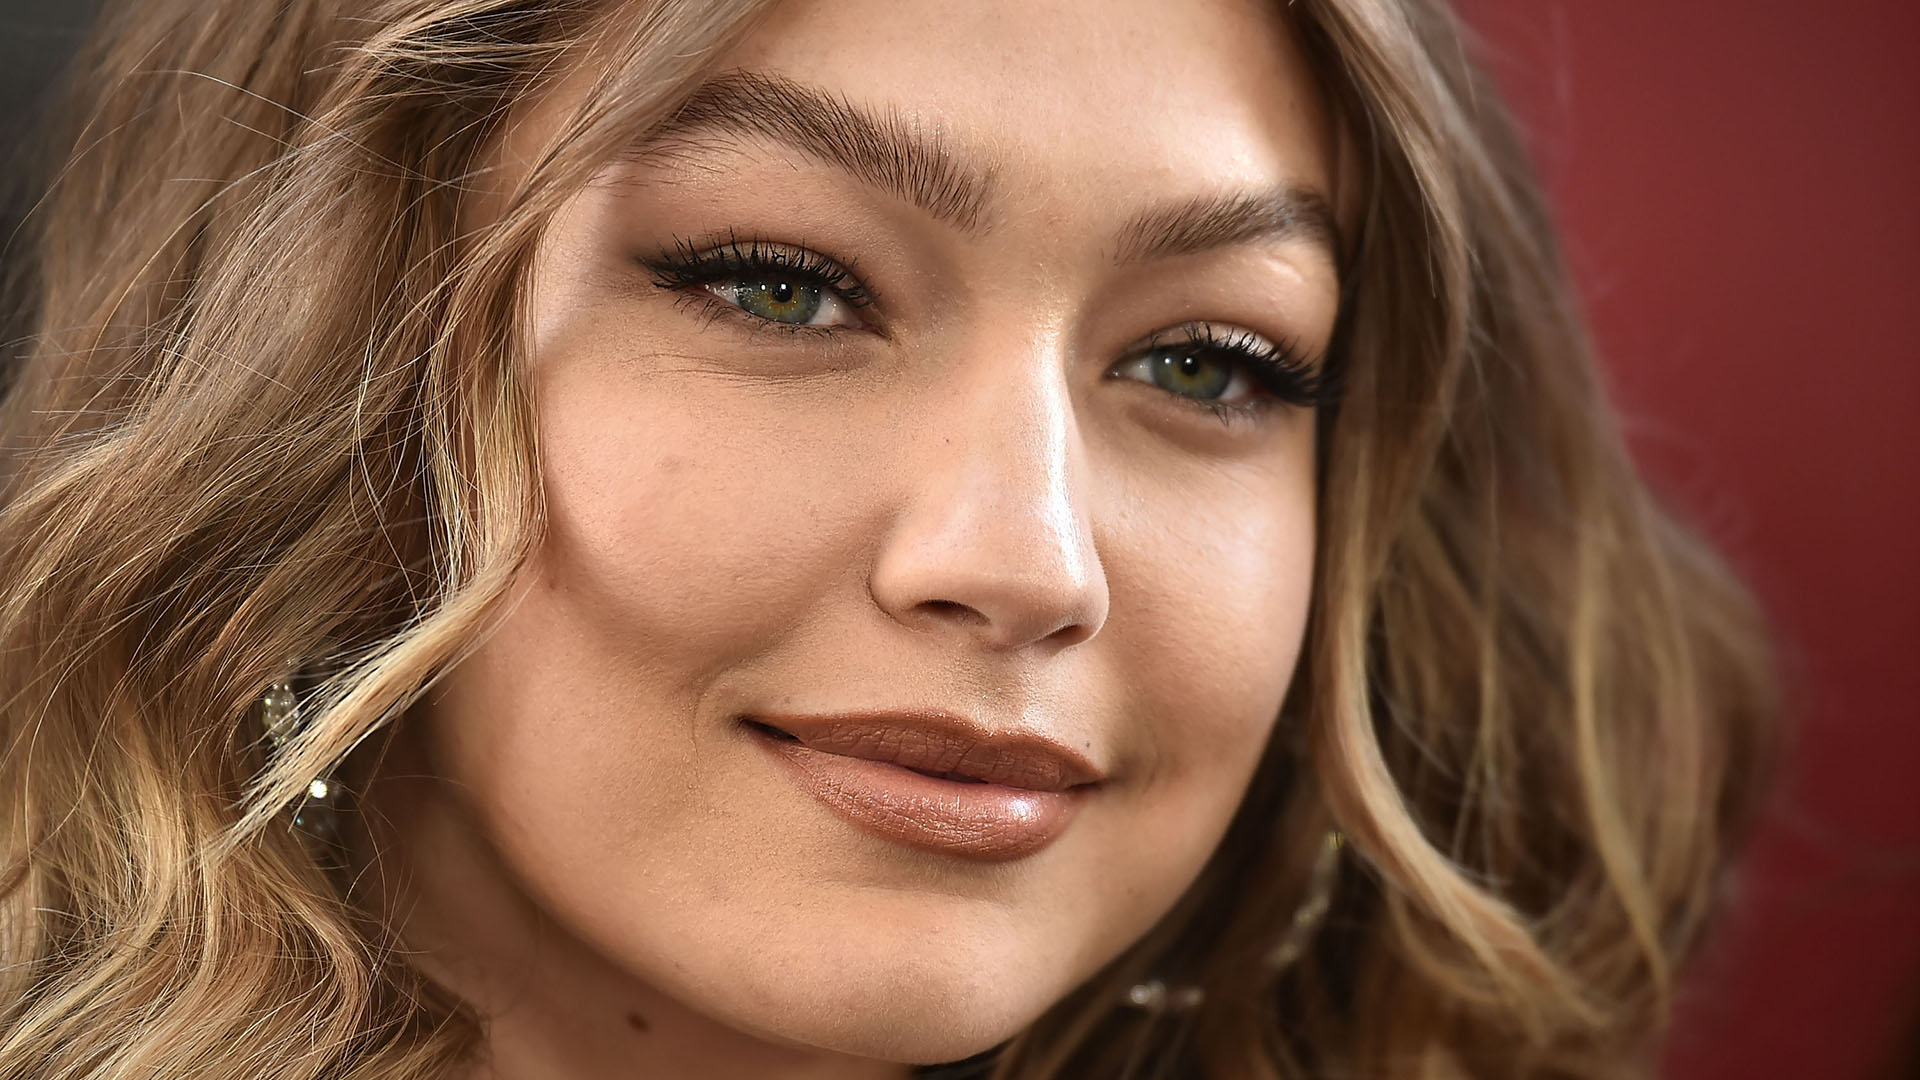 Paris Fashion Week Spring/Summer 2020 Has Hardly Begun, but Gigi Hadid Is Already Our Street Style Queen